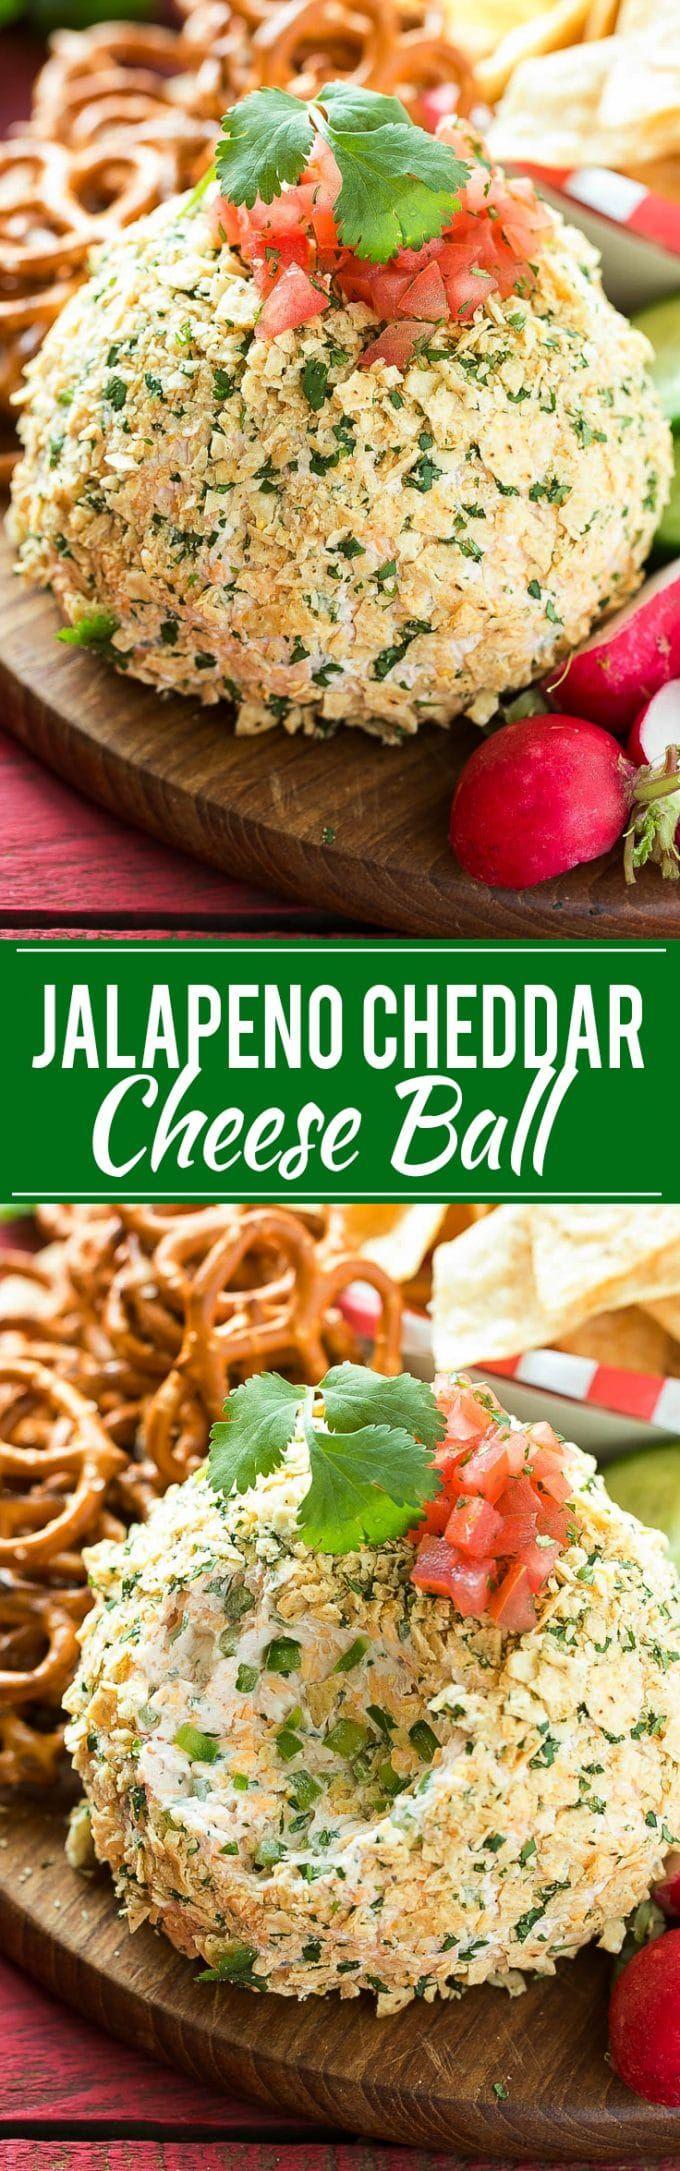 Jalapeno Cheddar Cheese Ball Recipe | Cheddar Cheese Ball | Best Cheddar Cheese Ball | Best Jalapeno Cheddar Cheese Ball | Cheese Ball